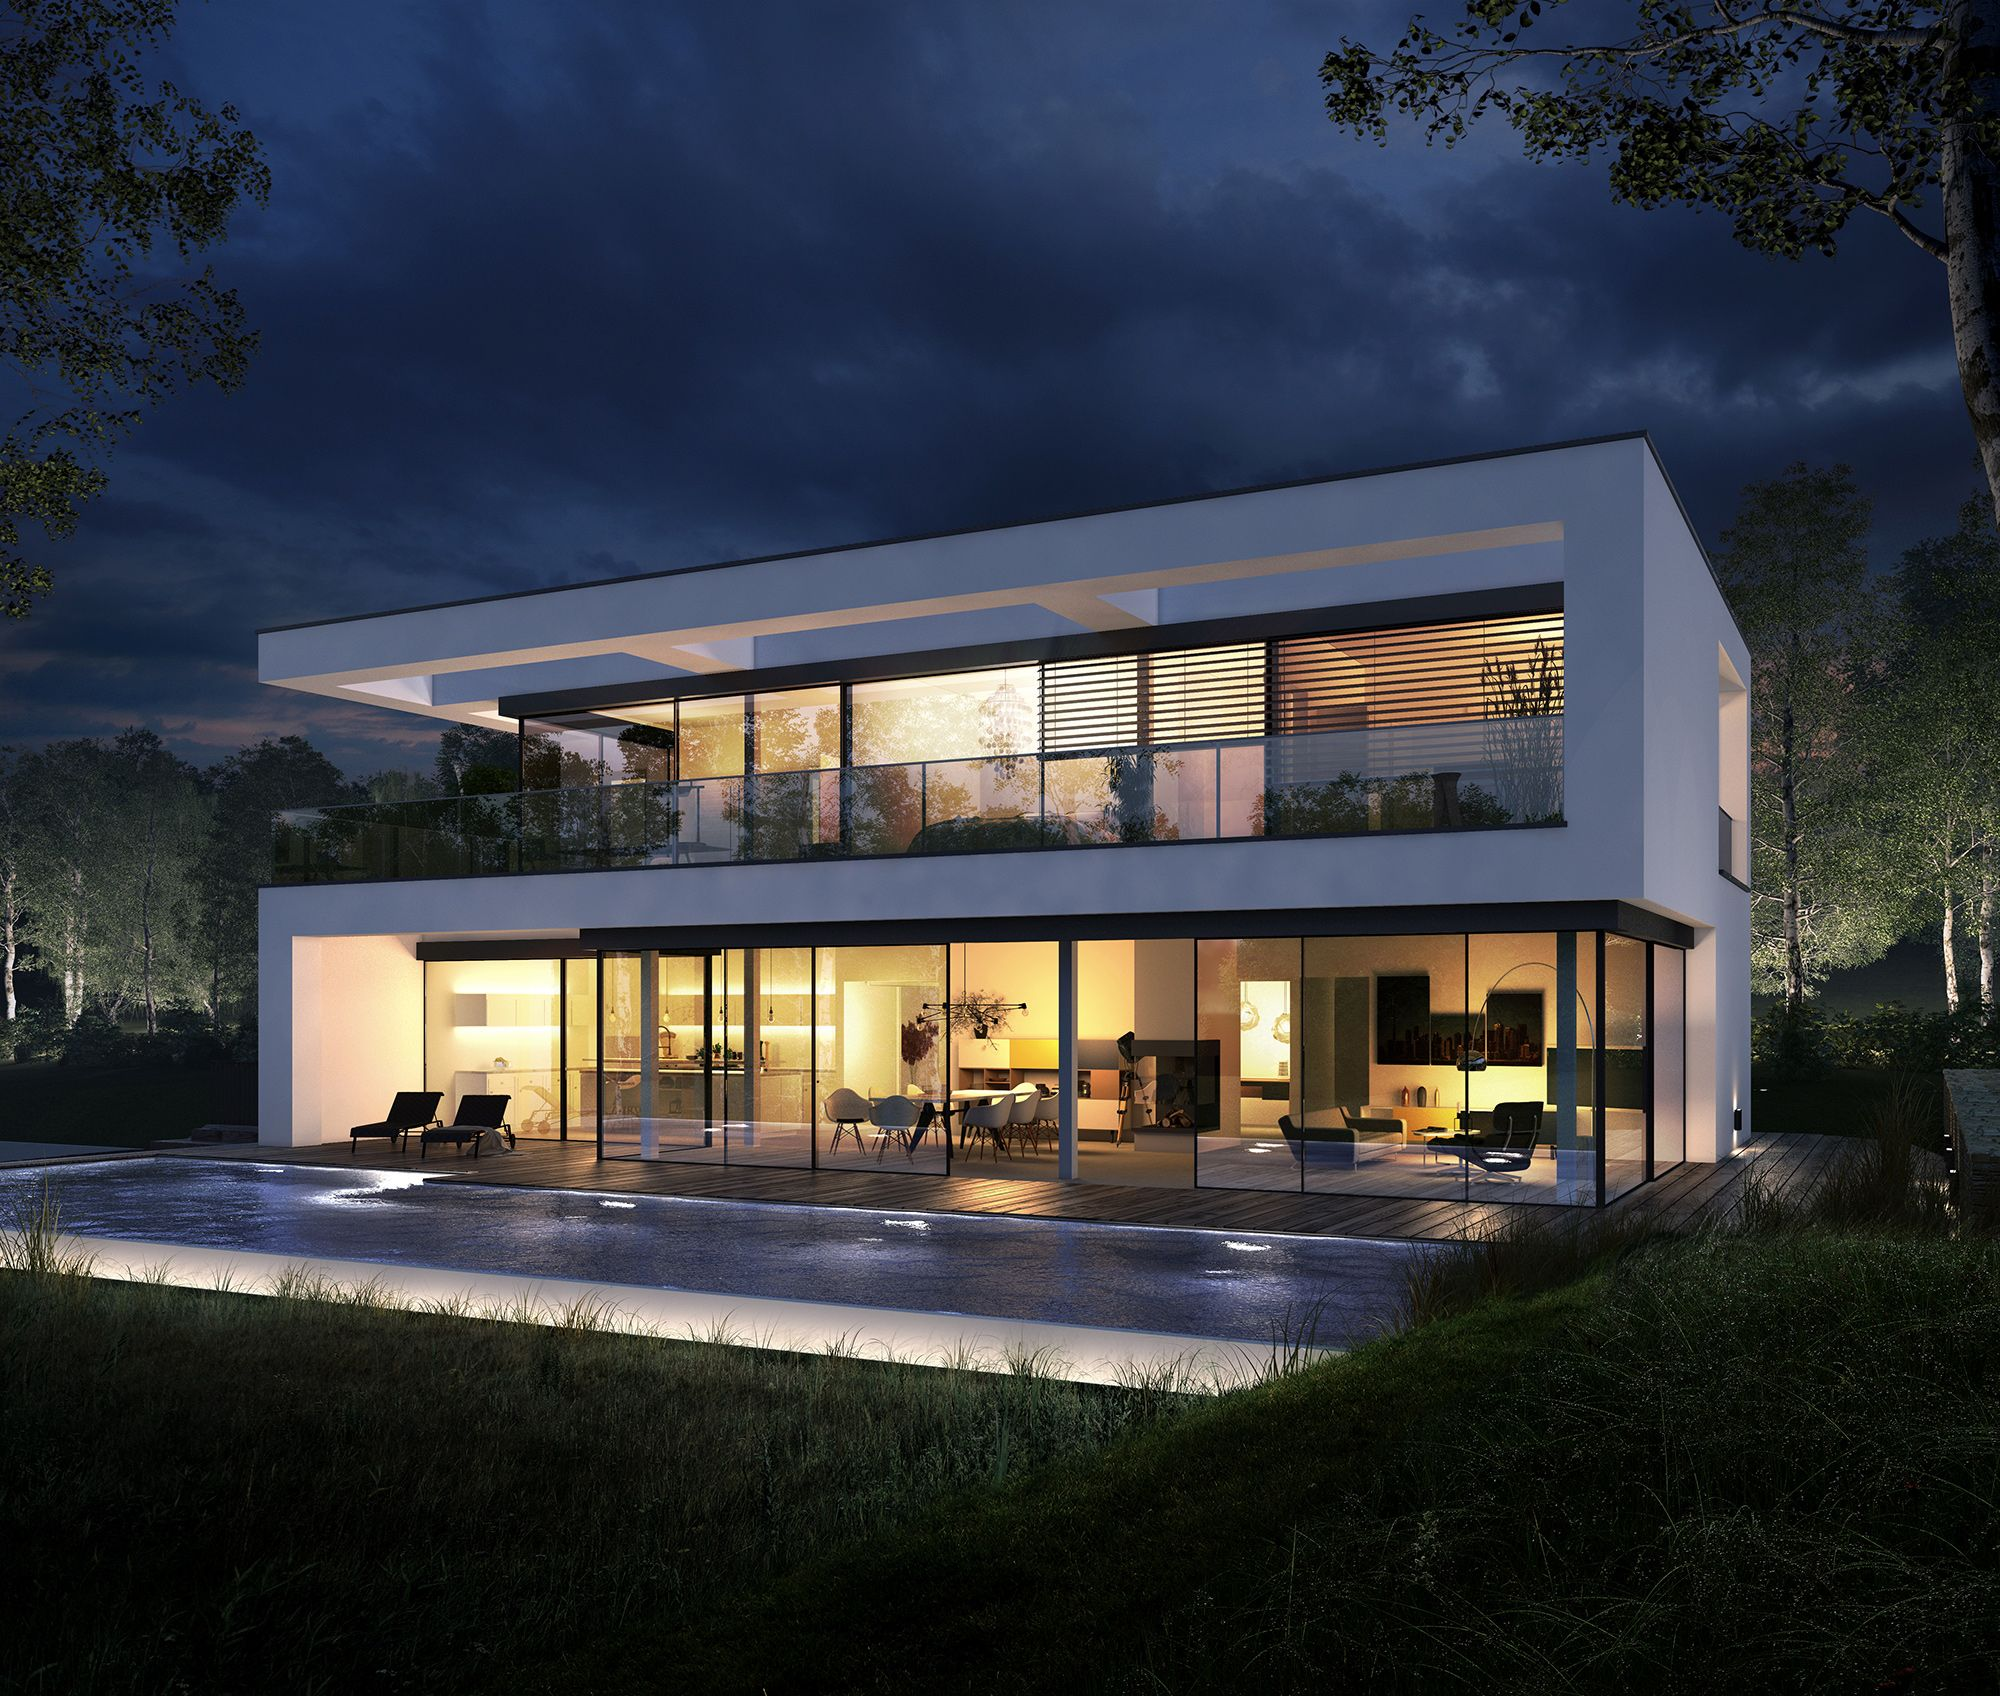 OKAL Haus | Architecture | Pinterest | Architecture, House and Villas